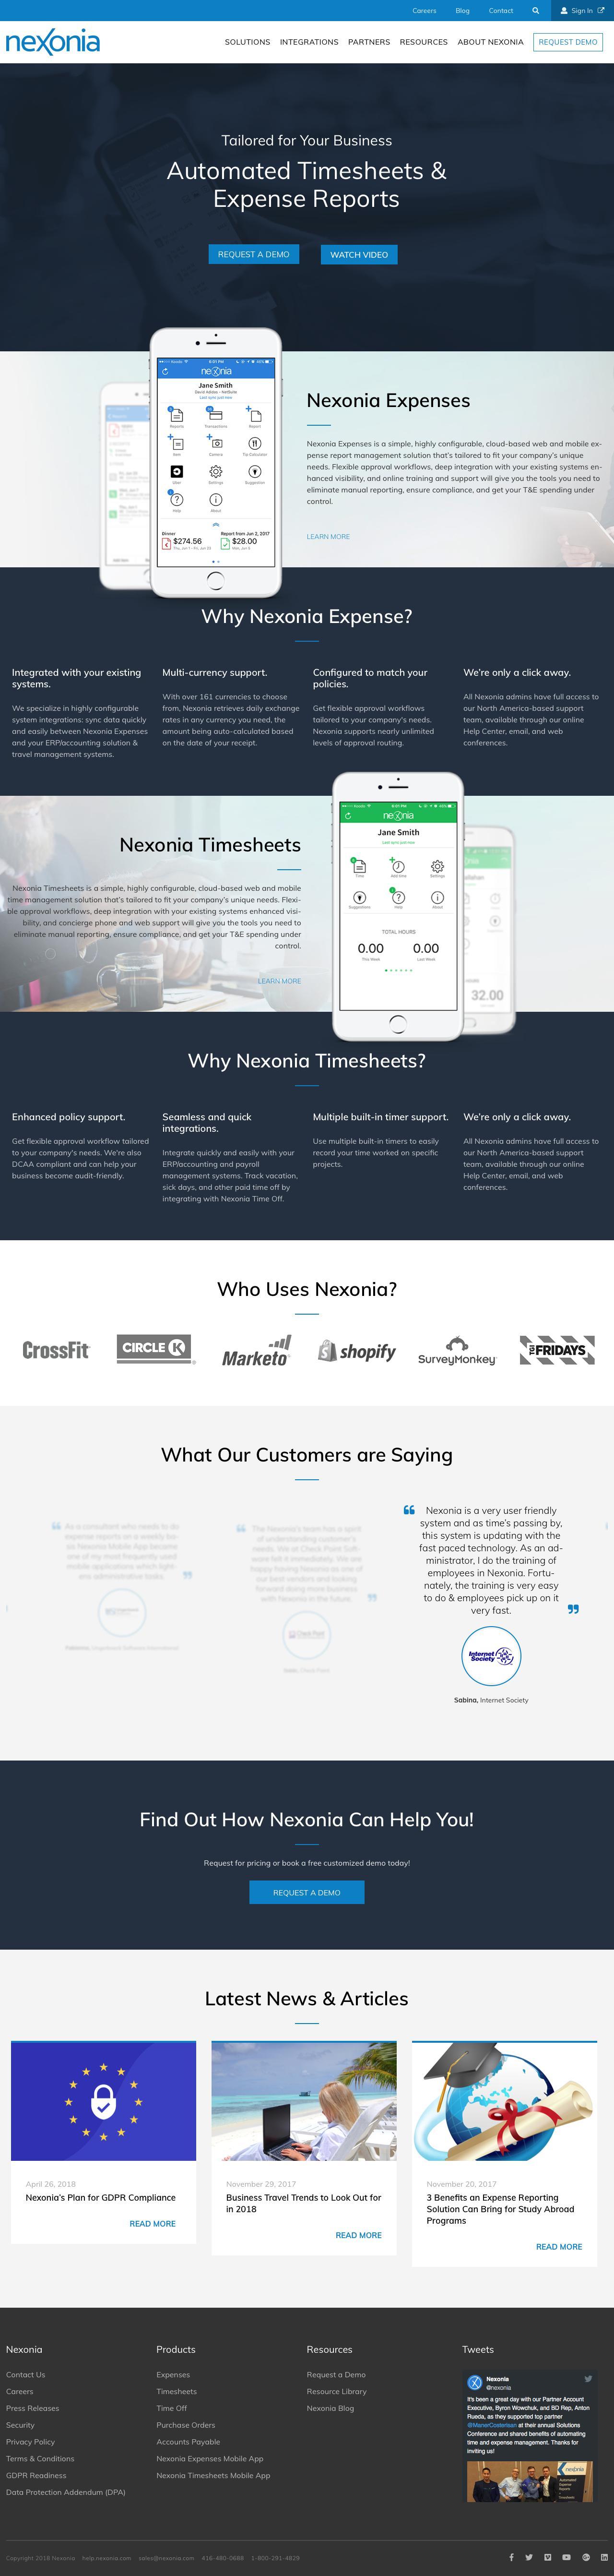 Screenshot of nexonia.com - Nexonia Home | Expense Reporting and Time Reporting Software | Nexonia - captured June 18, 2018